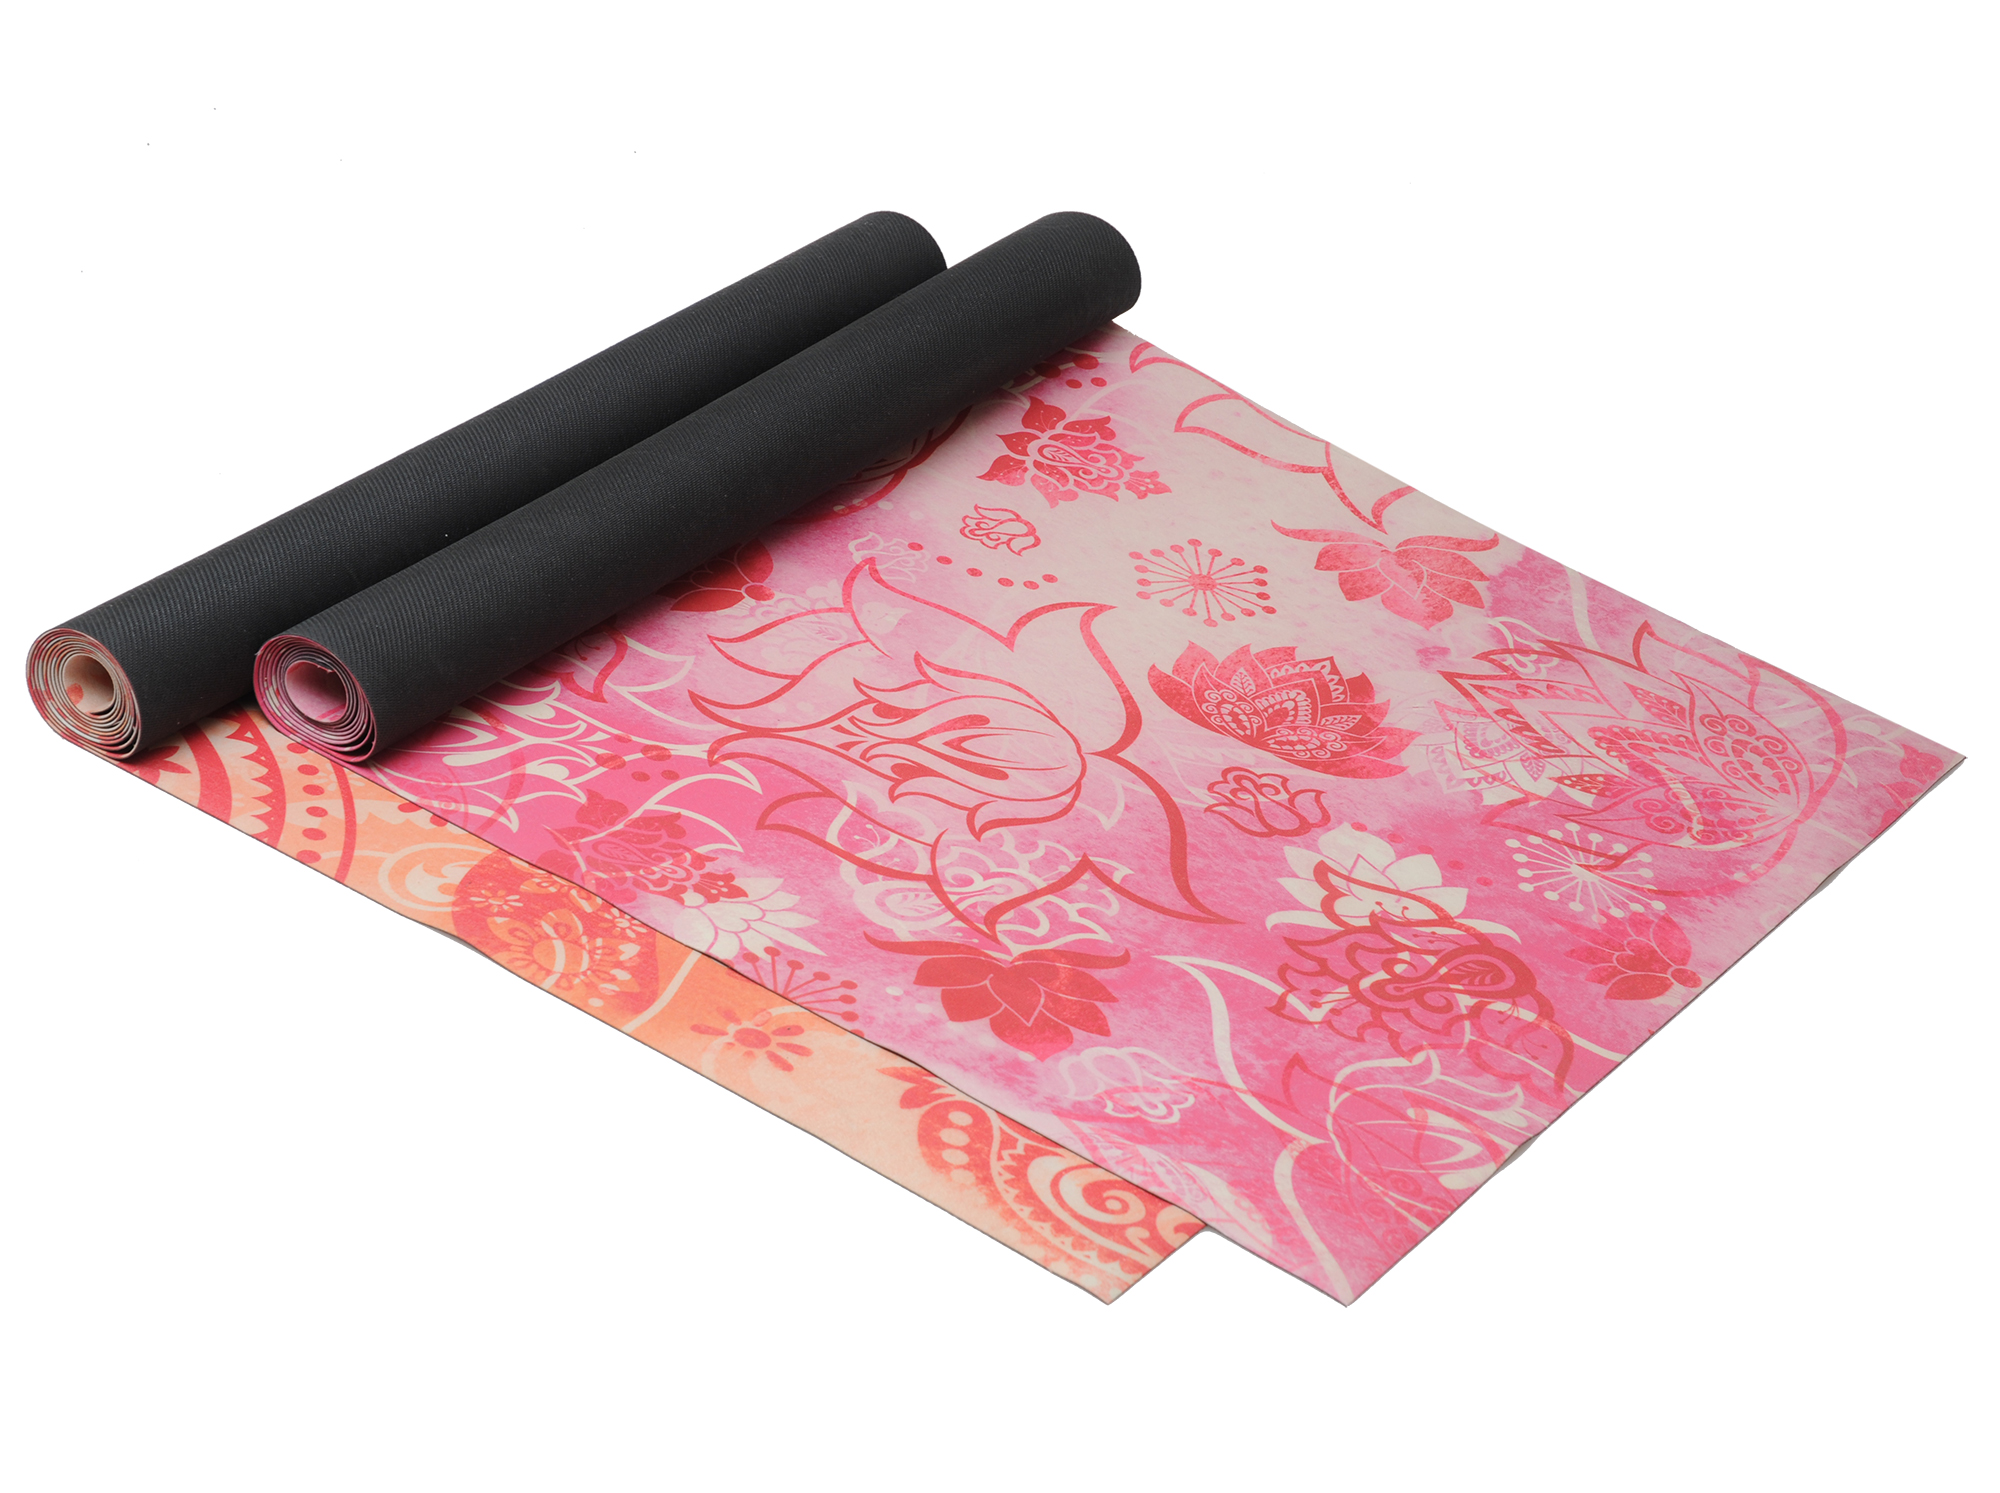 Yogamatte yogimat® travel - art collection